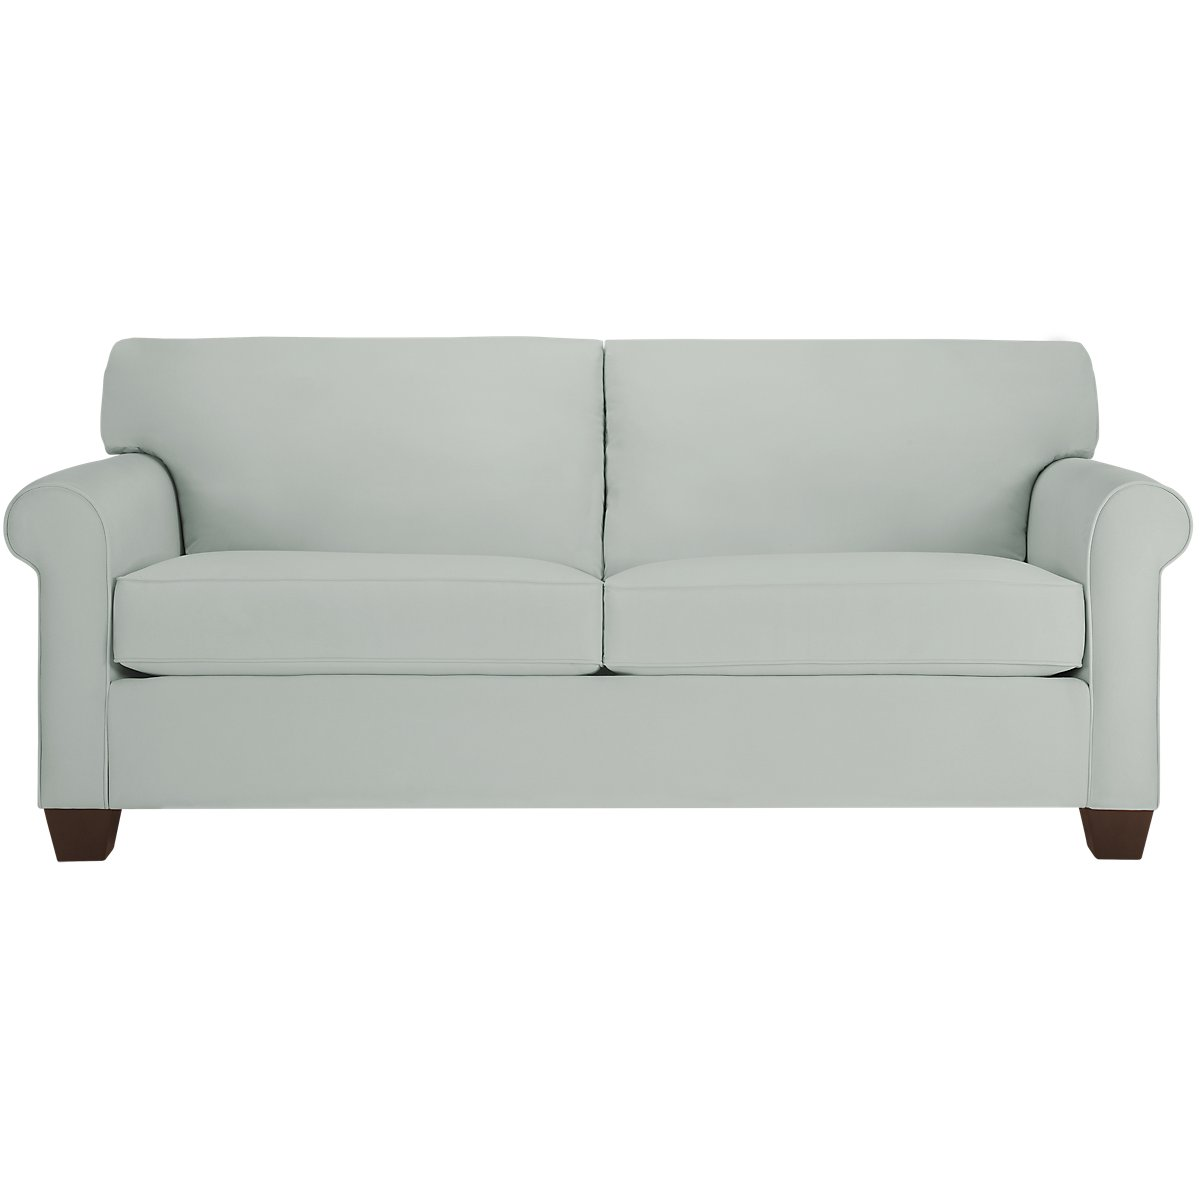 Corlis Light Blue Fabric Sofa